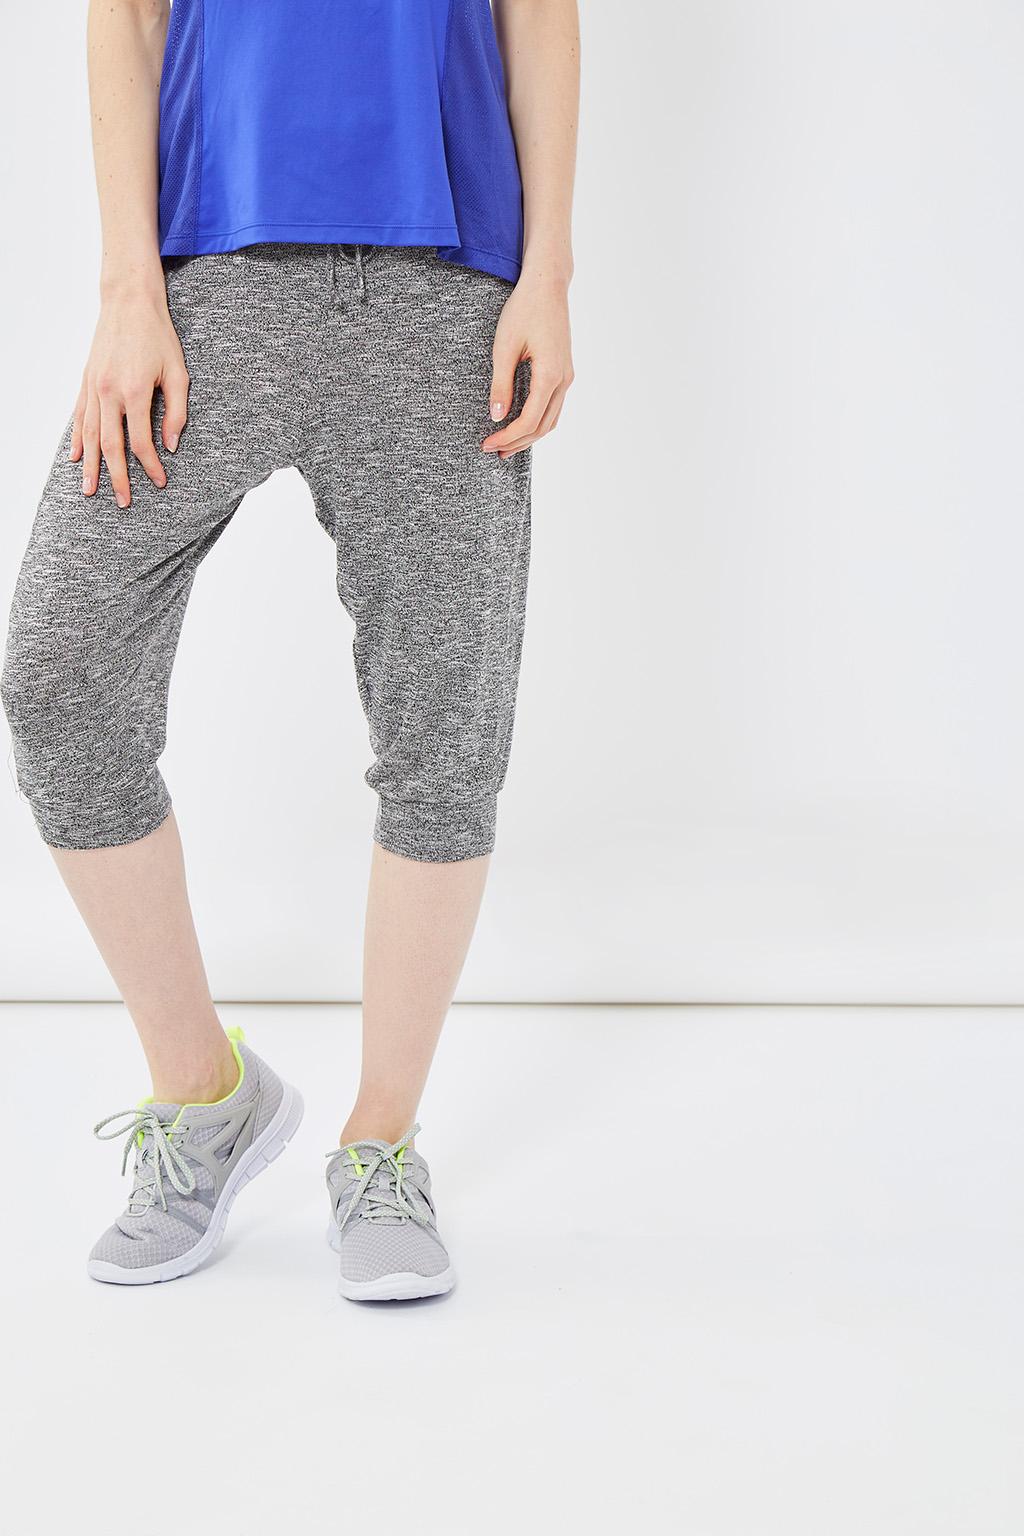 Vente privée femme Oysho lingerie, homewear et sport, sarouel de sport gris chiné